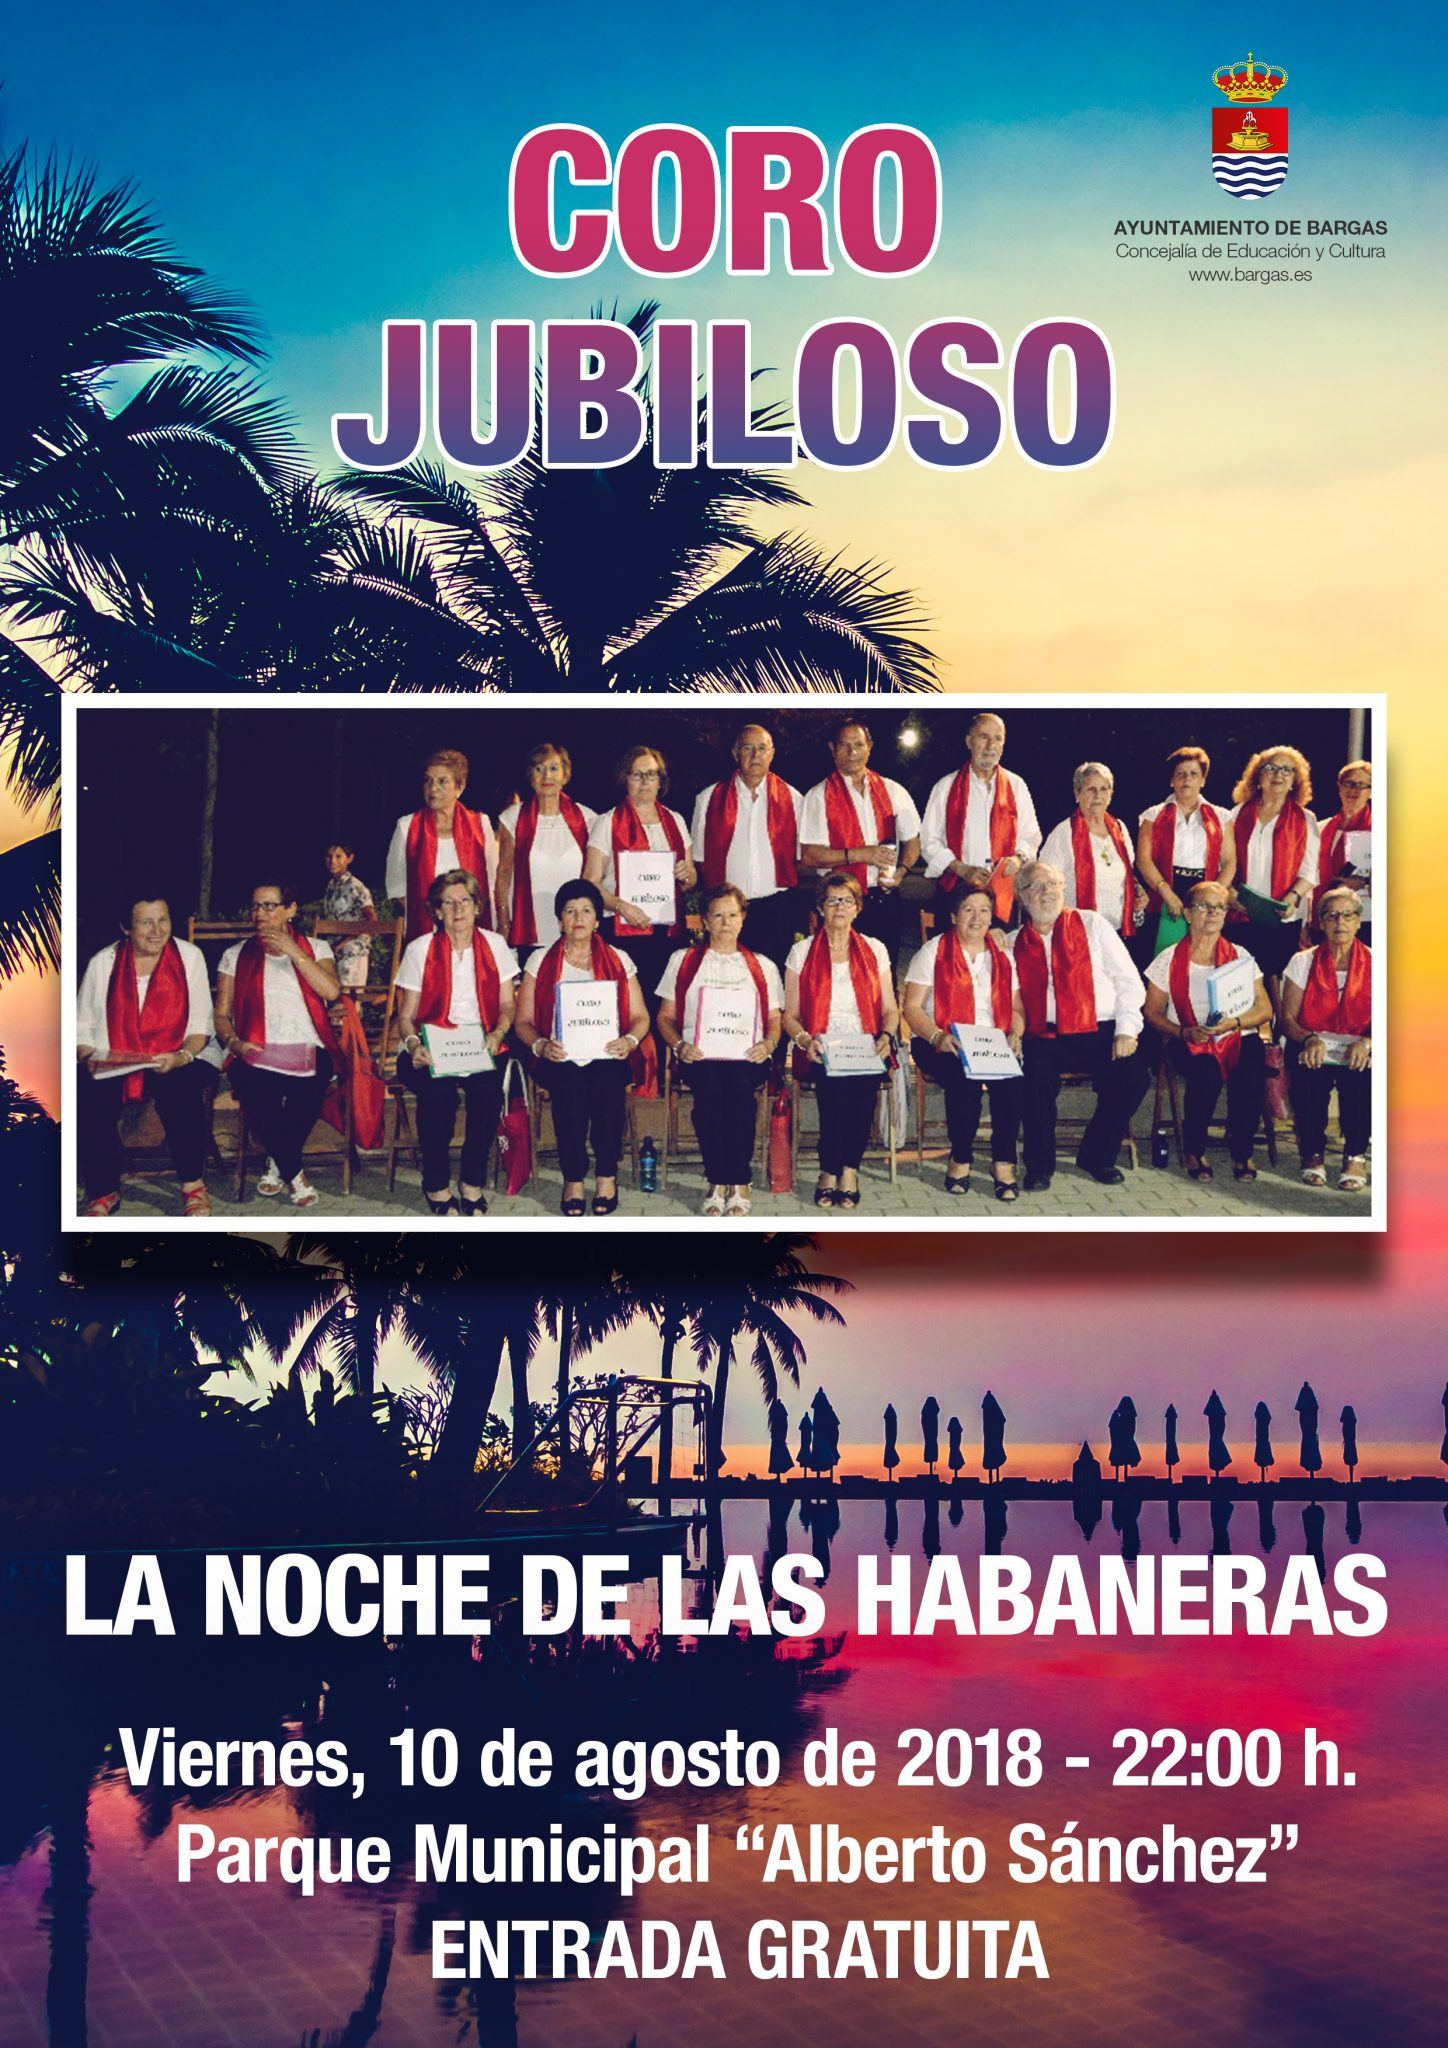 Coro Jubiloso: La noche de las habaneras